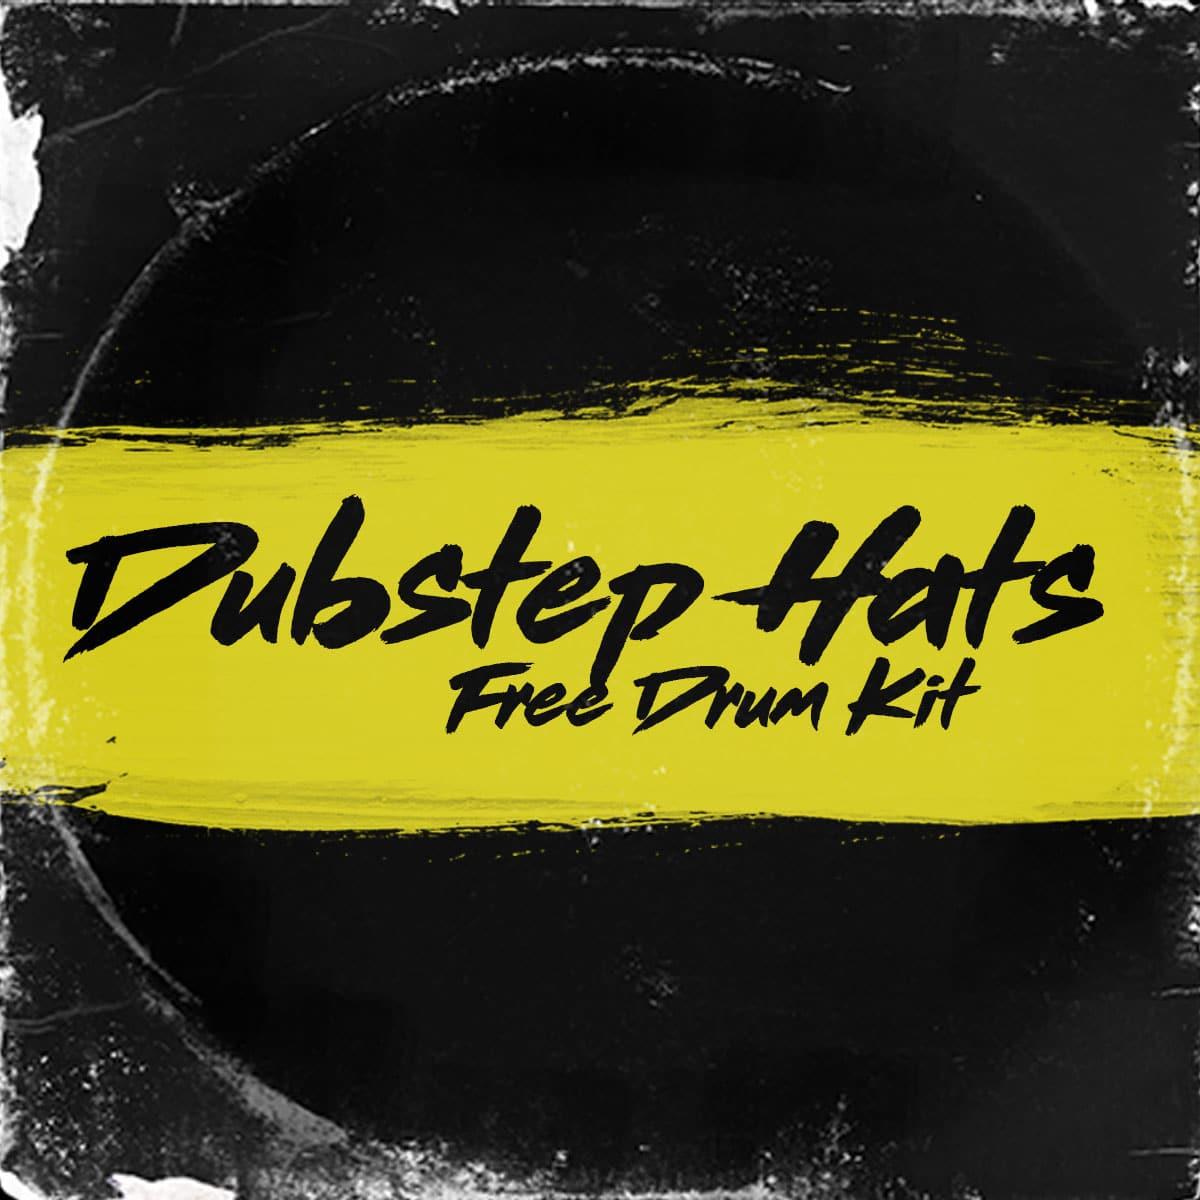 Dubstep Hats